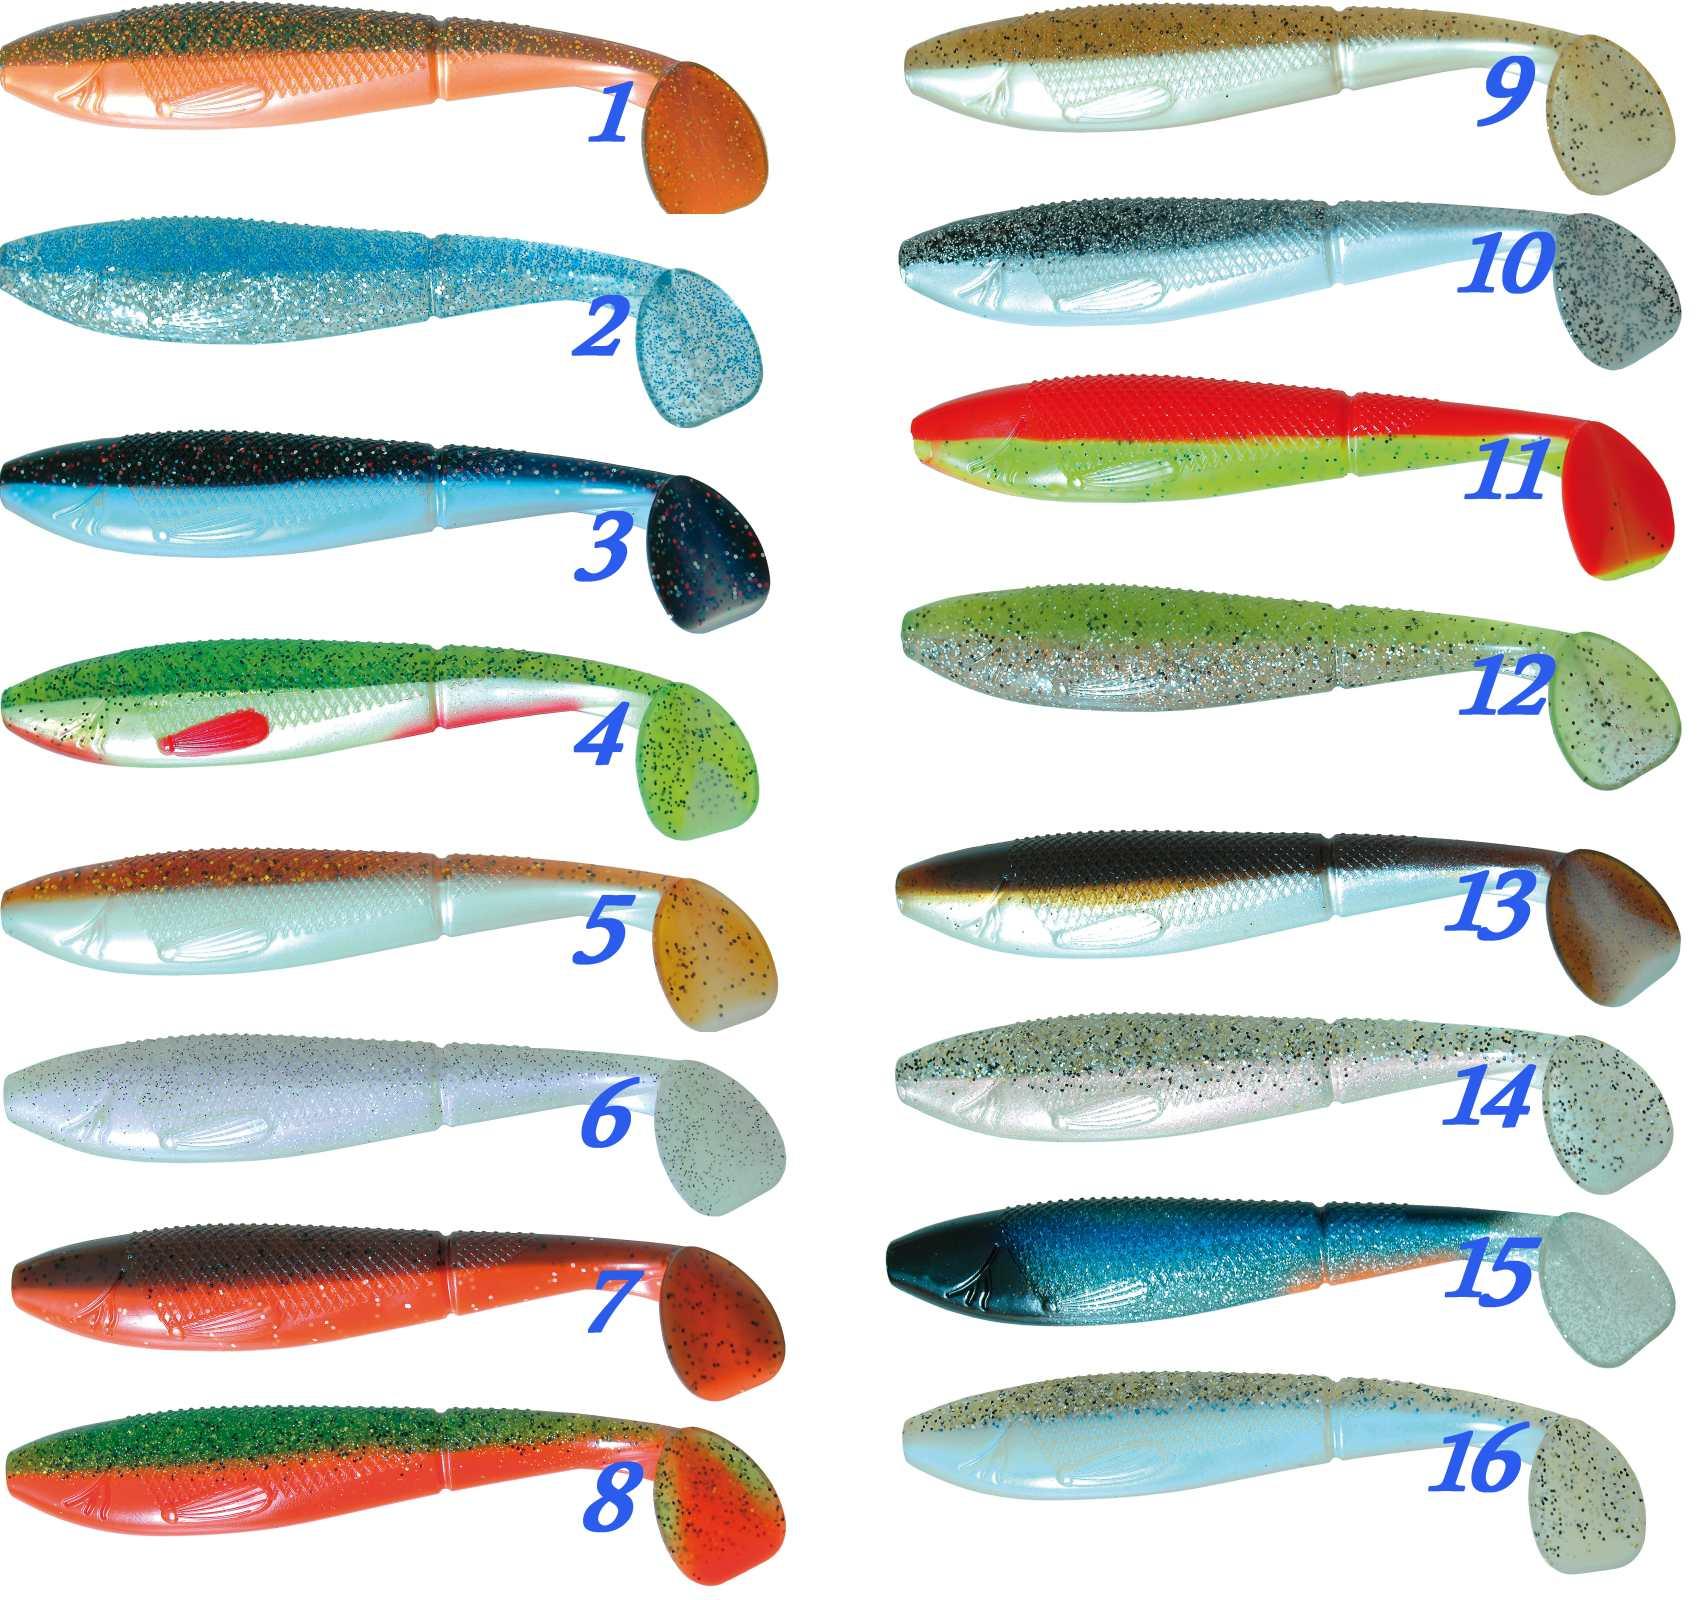 Gumová nástraha Atoka Scaler 16cm / 2ks rybí aroma, riper - zvìtšit obrázek